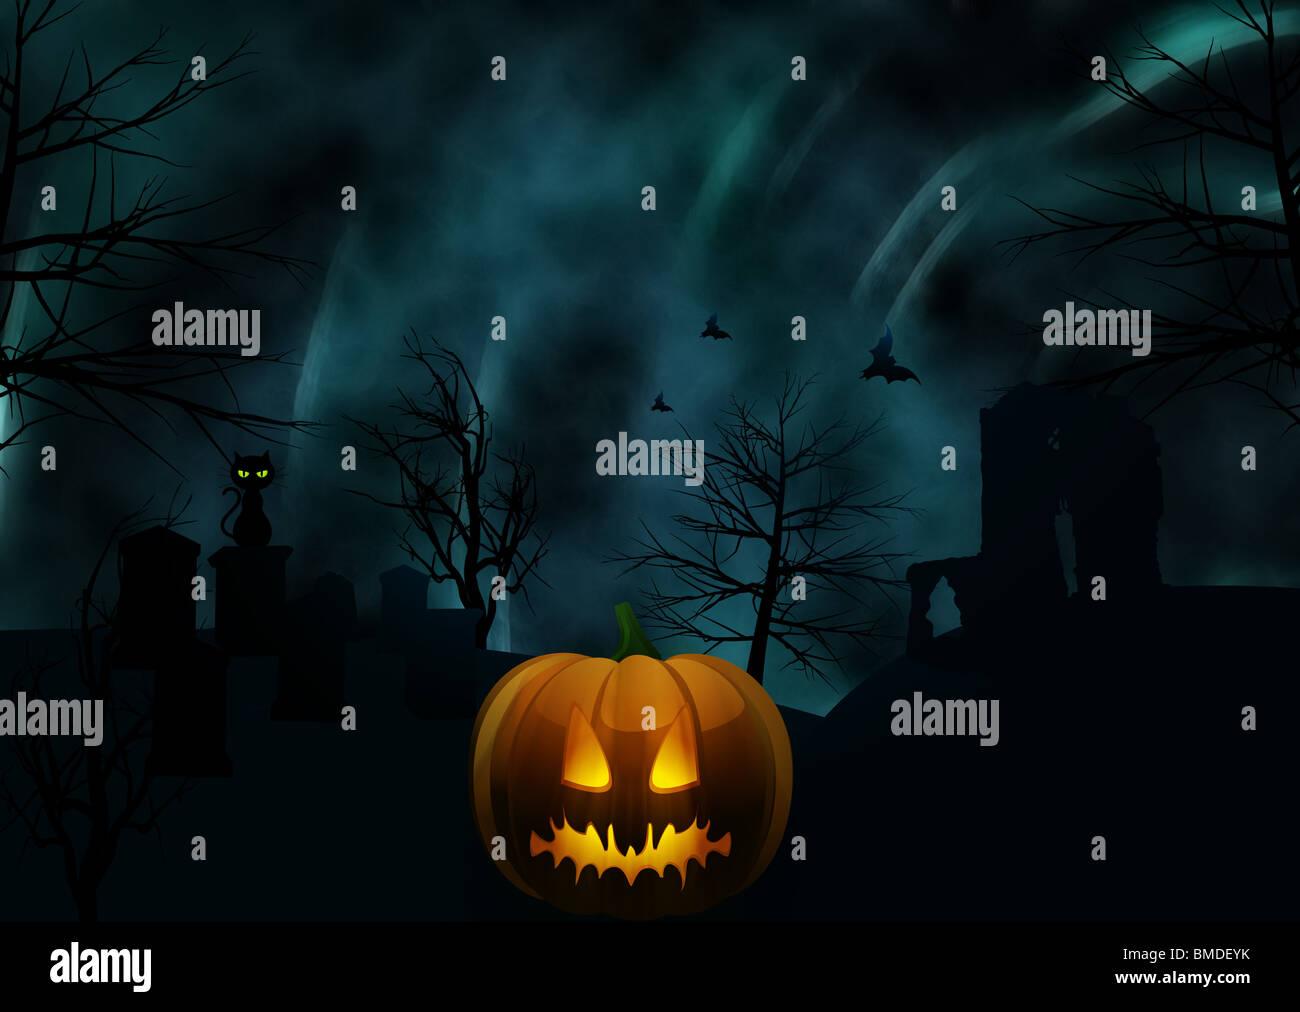 Halloween Graveyard Scene With Glowing Pumpkin And Black Cat